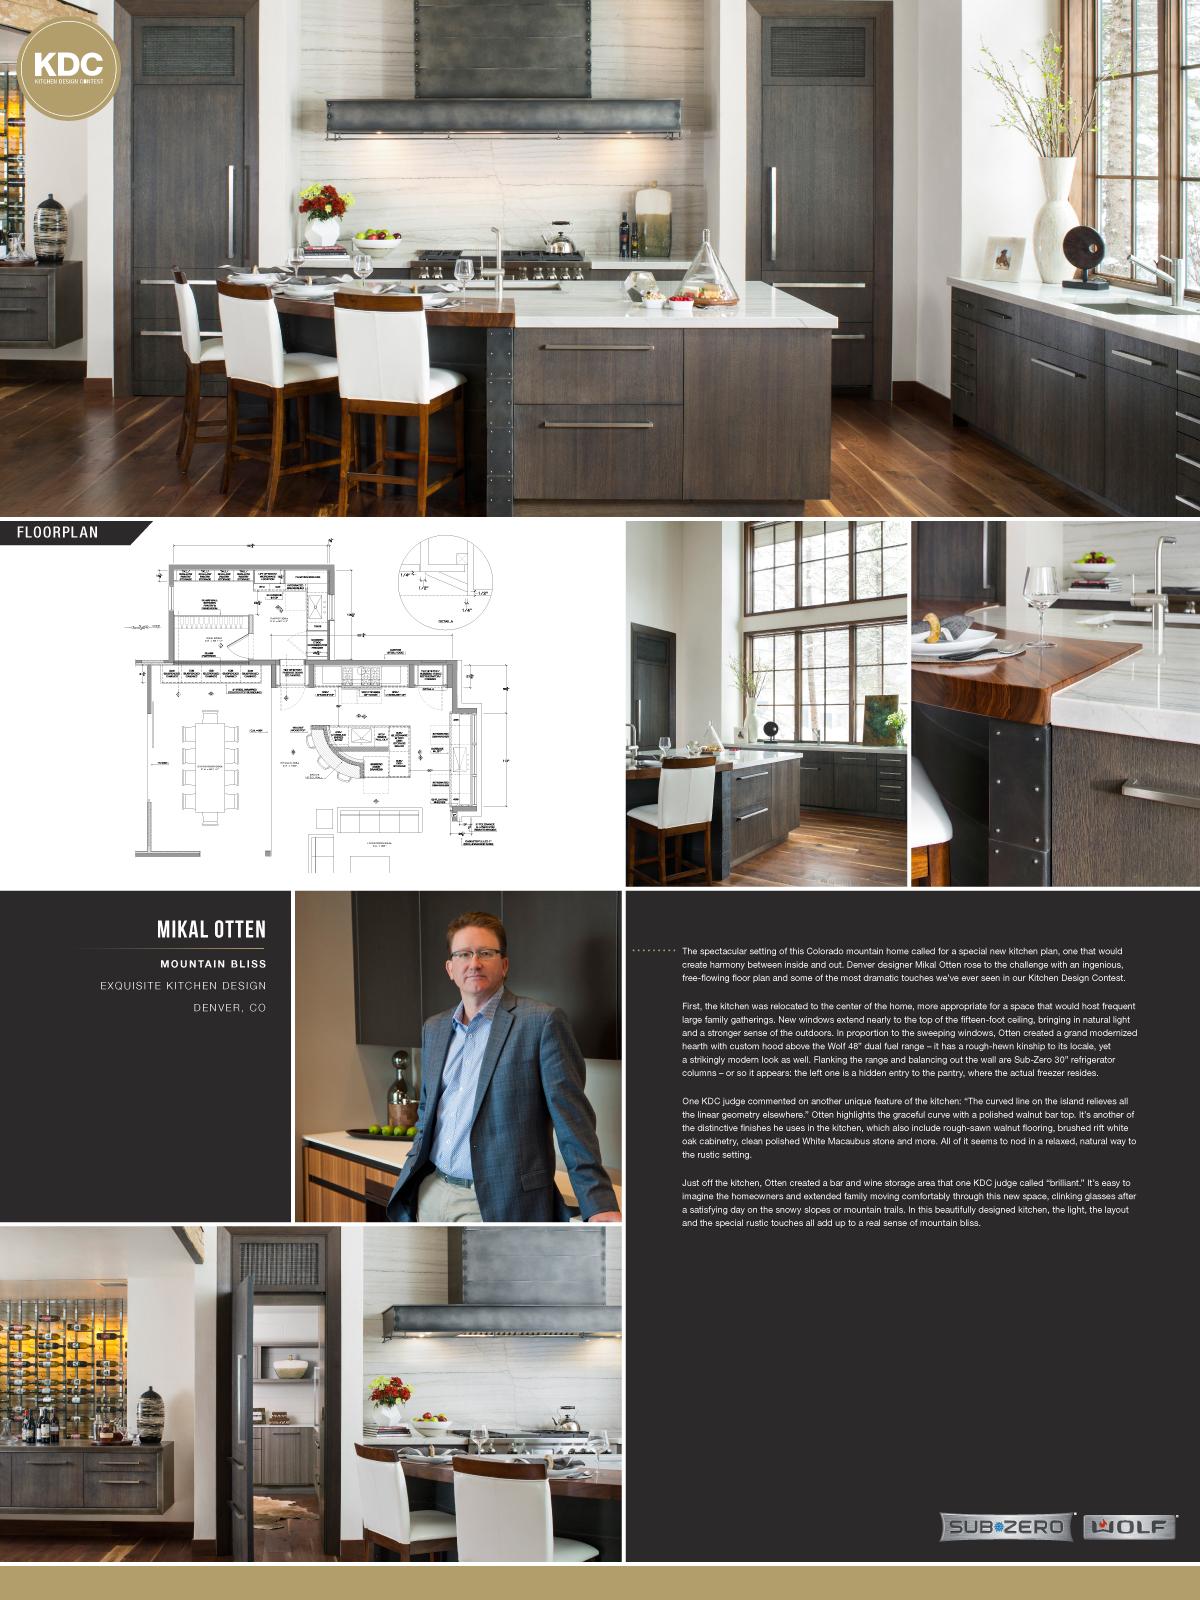 SubZero  Wolf Kitchen Design Contest Life Of An Architect - Kitchen design winnipeg